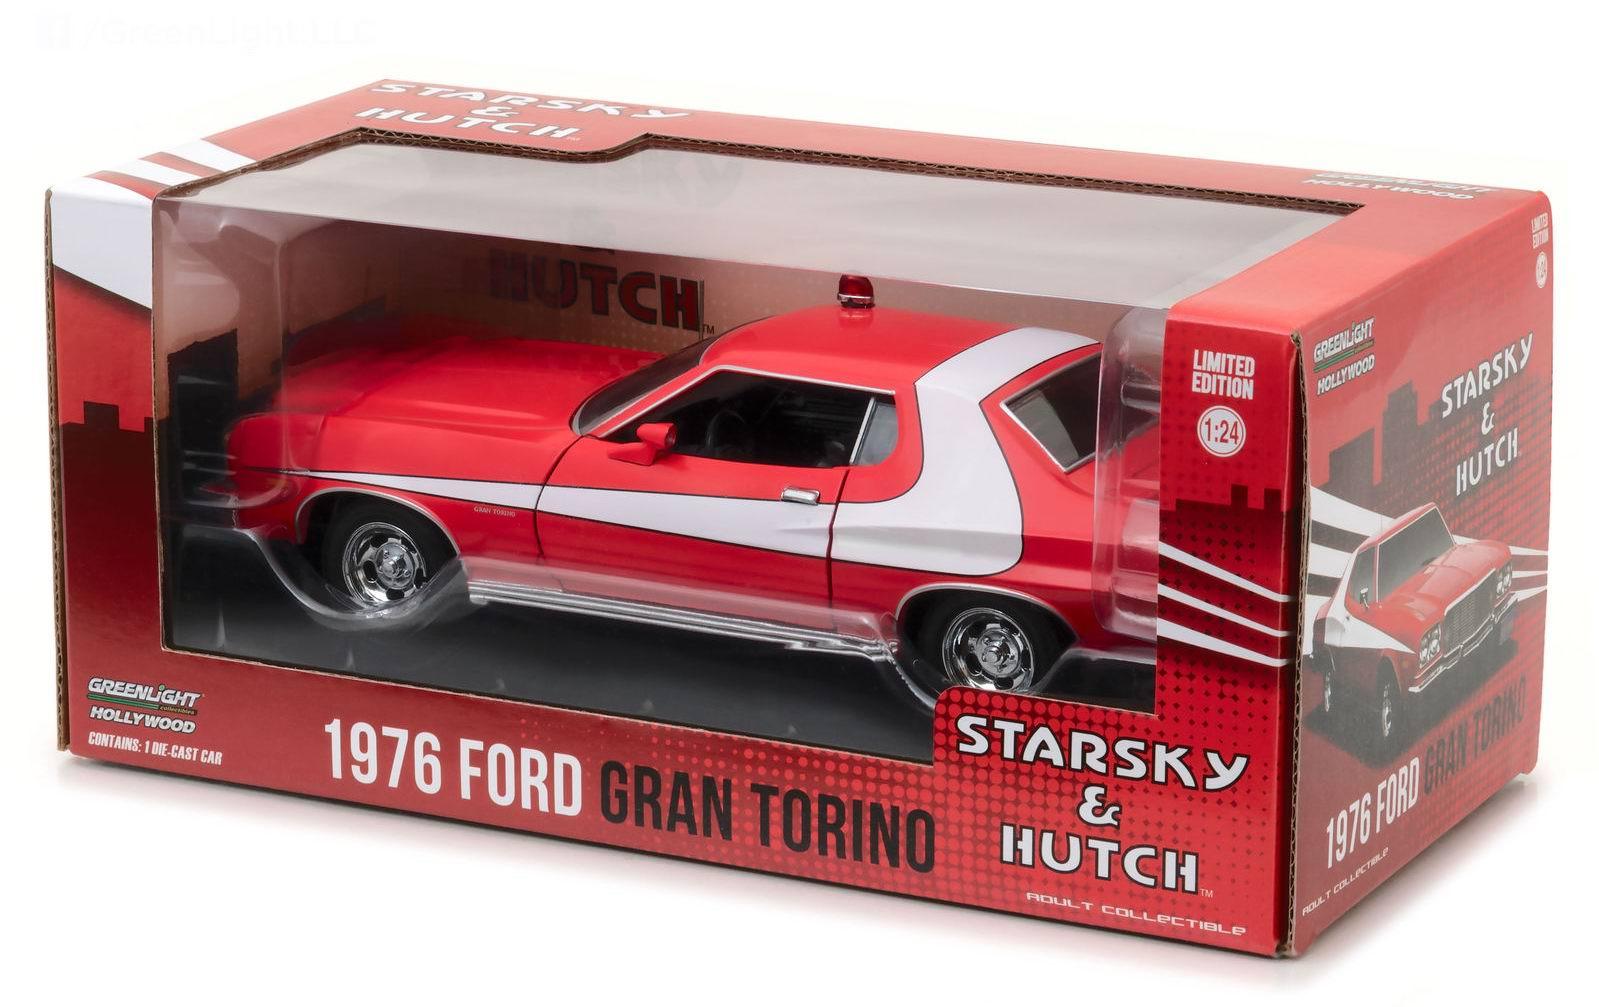 Figurines Cars Movies 1976 Ford Gran Torino Starsky Et Hutch 1964 Grand Plastic Diecast Model 1 24